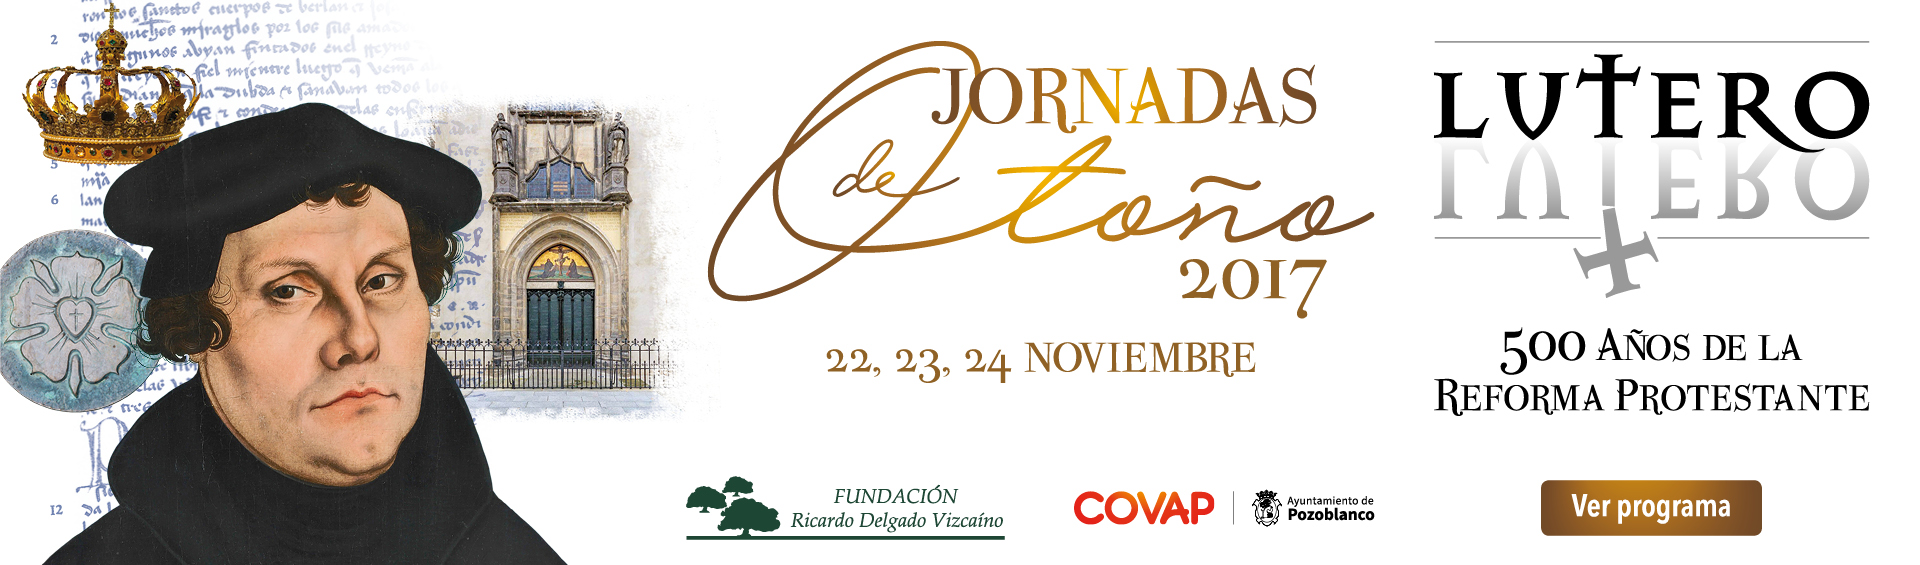 Jornadas de Otoño Fundación Ricardo Delgado Vizcaino